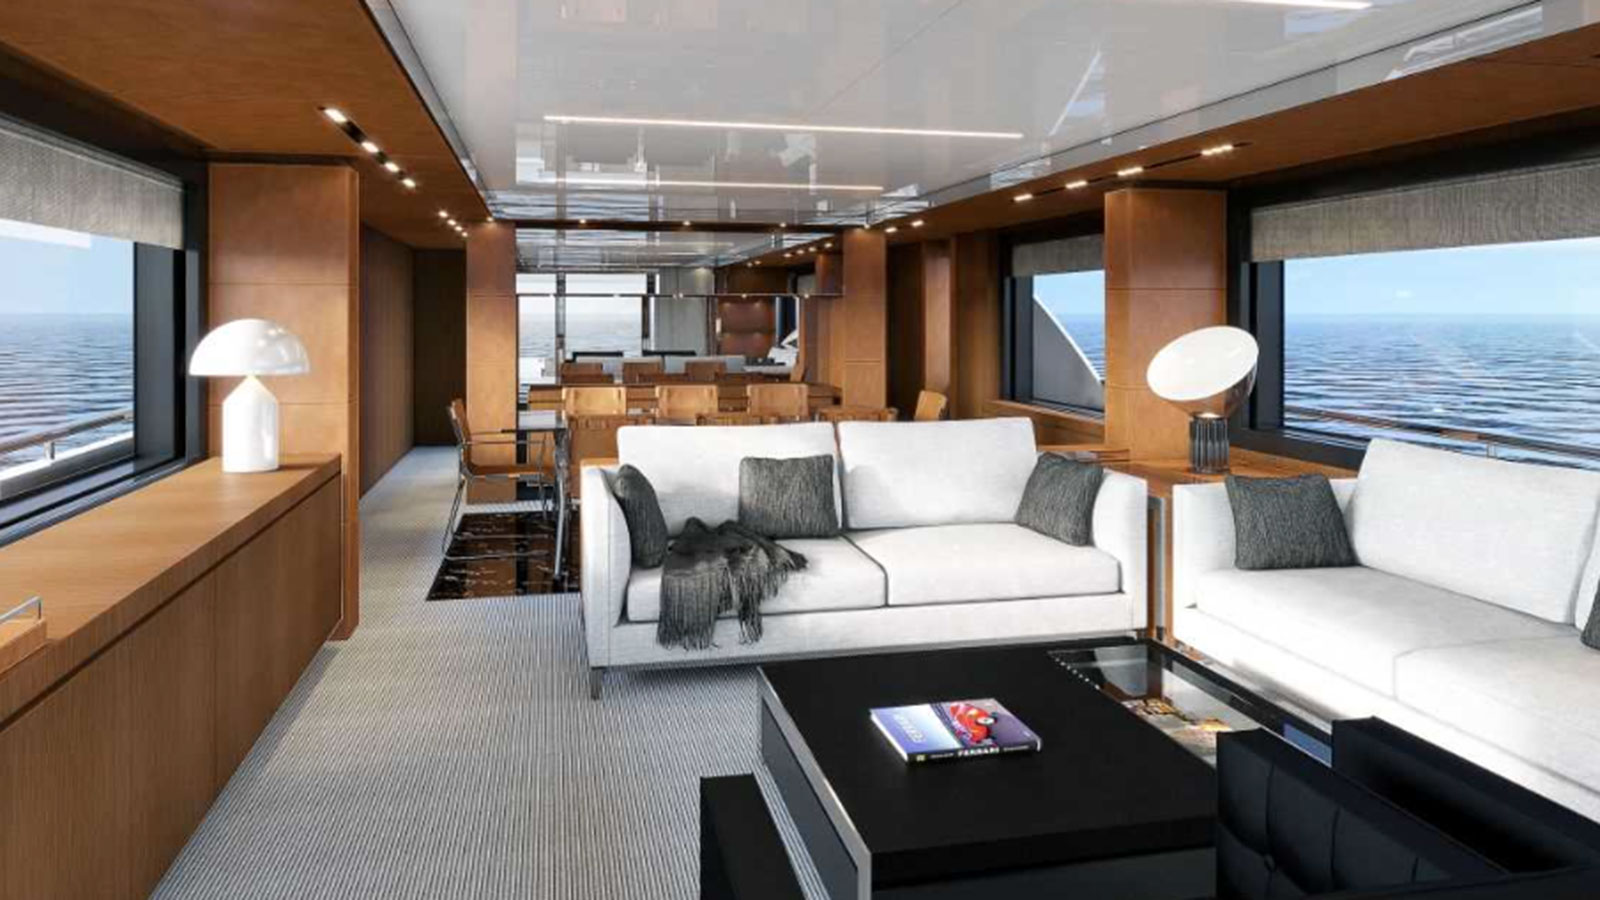 the-saloon-of-the-riva-100-corsaro-super-yacht